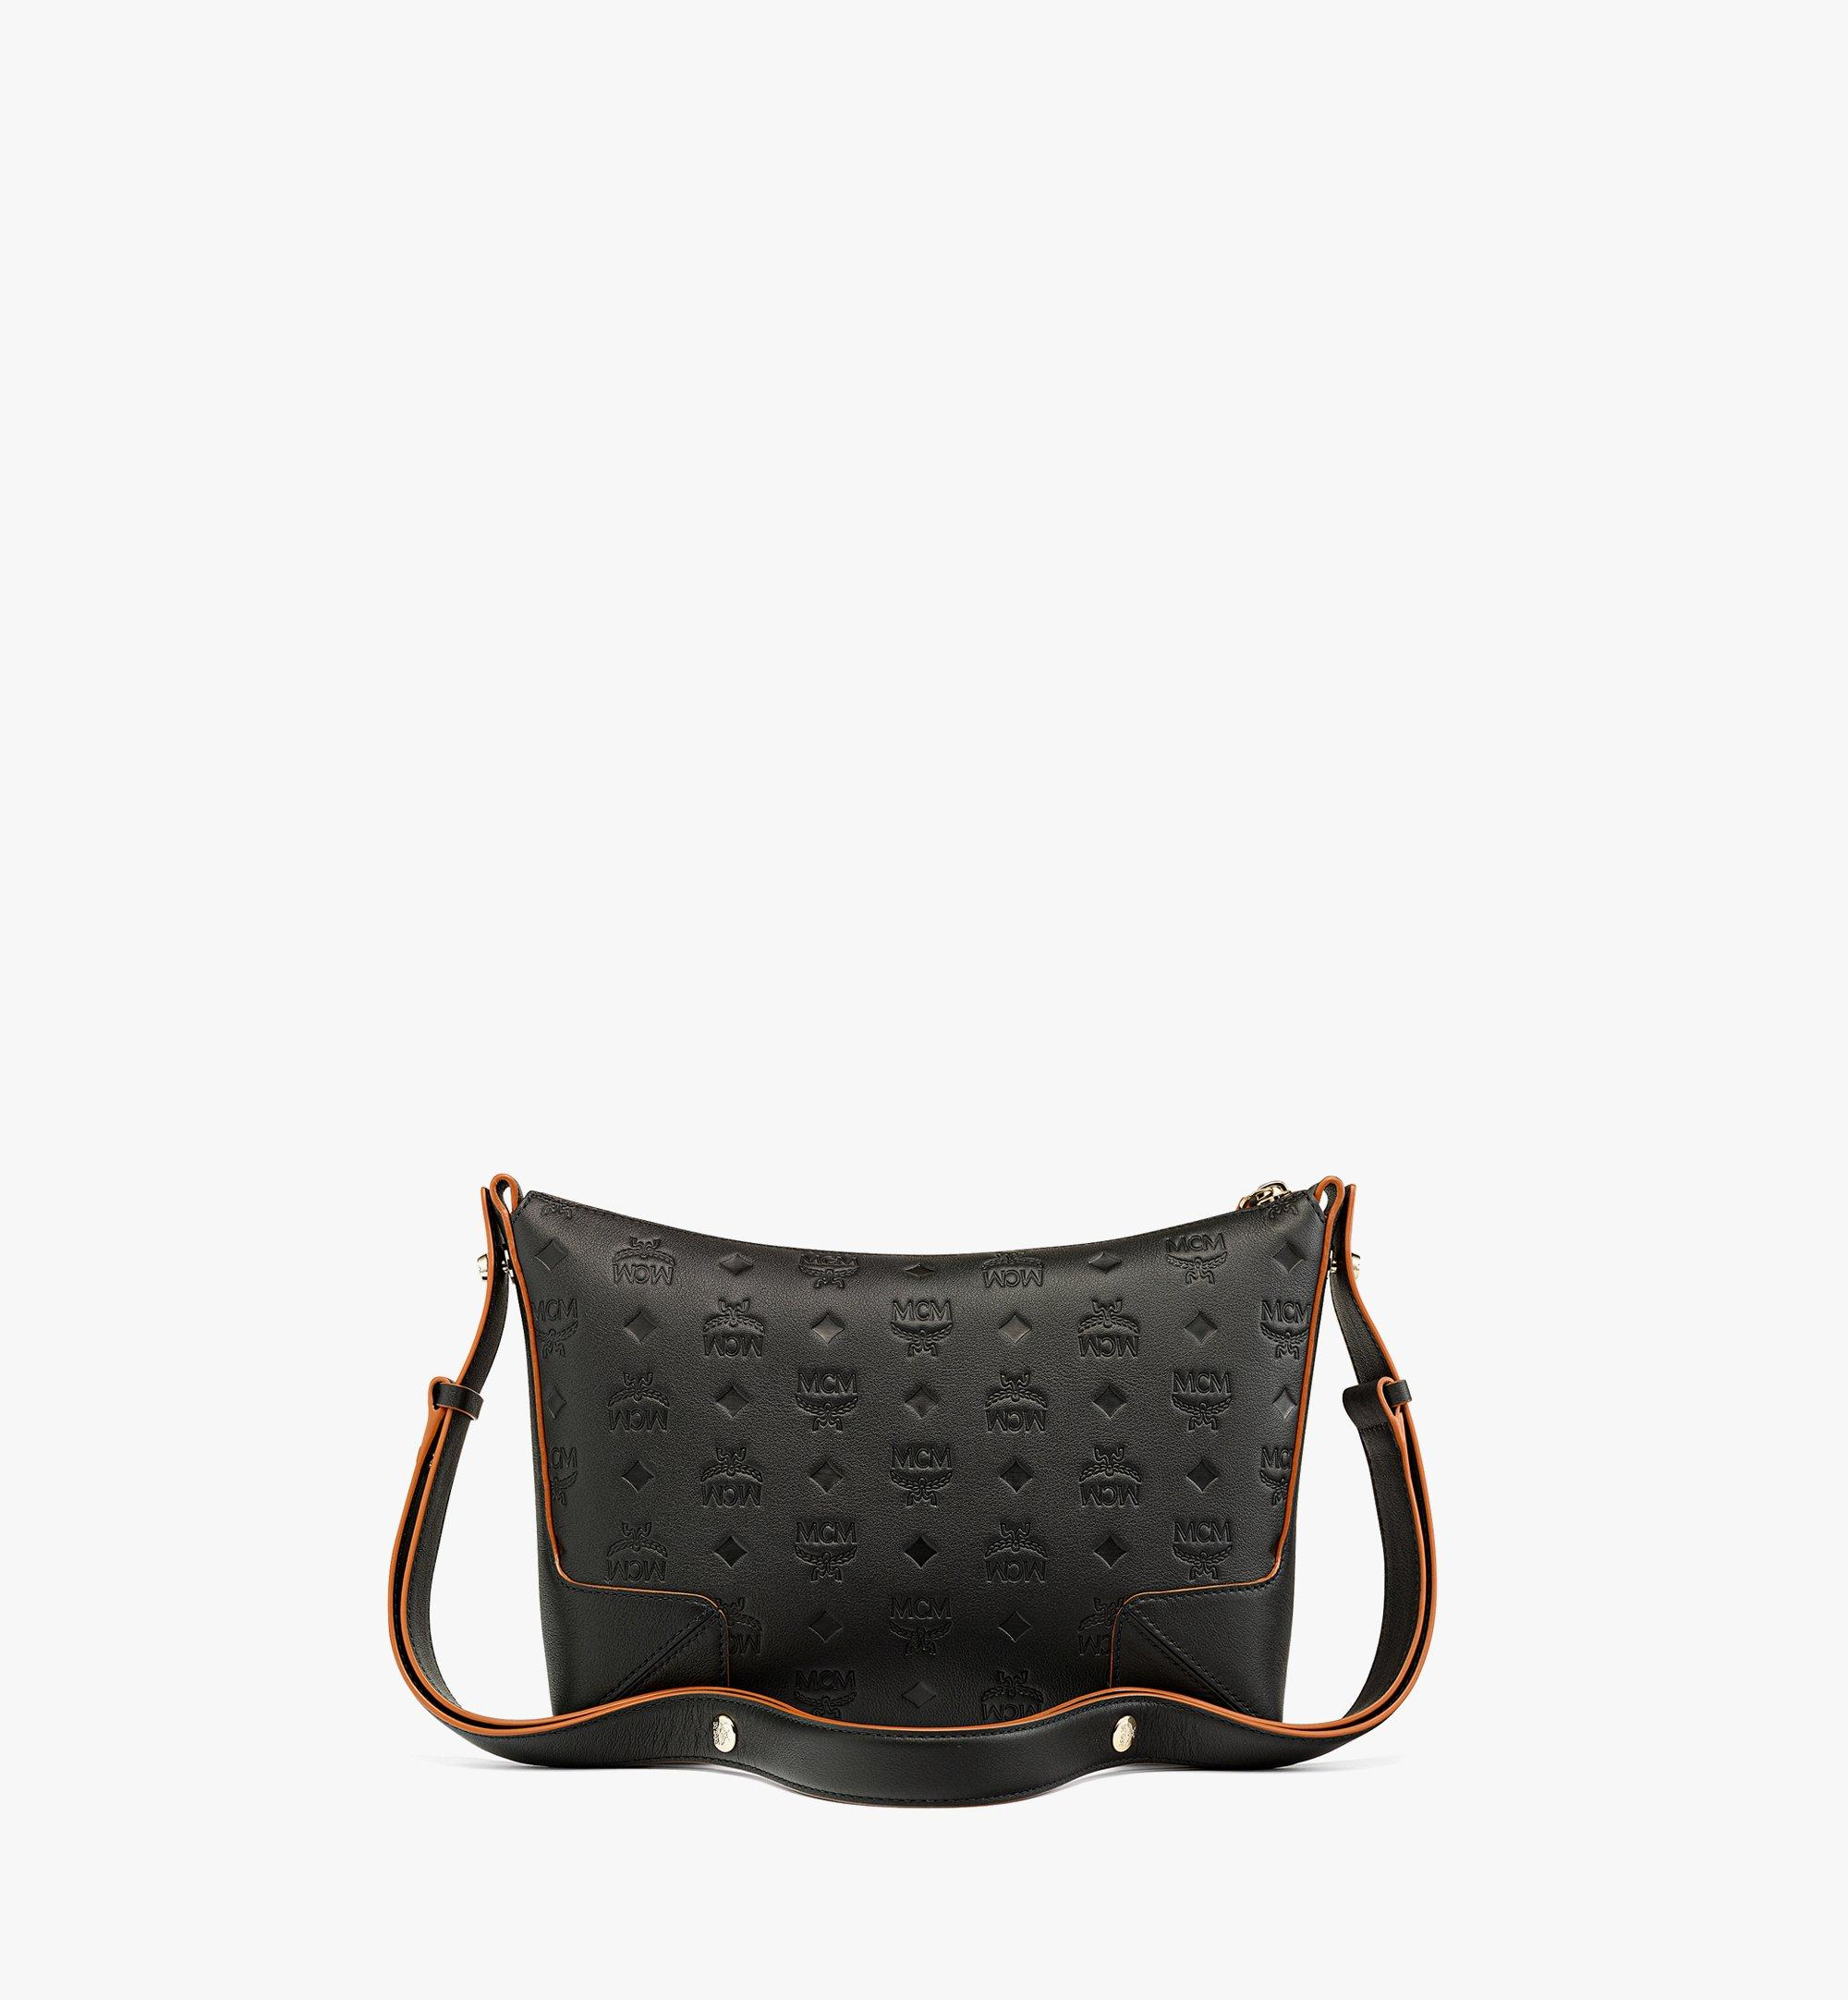 MCM Klara Shoulder Bag in Monogram Leather Black MWSBSKM02BK001 Alternate View 3